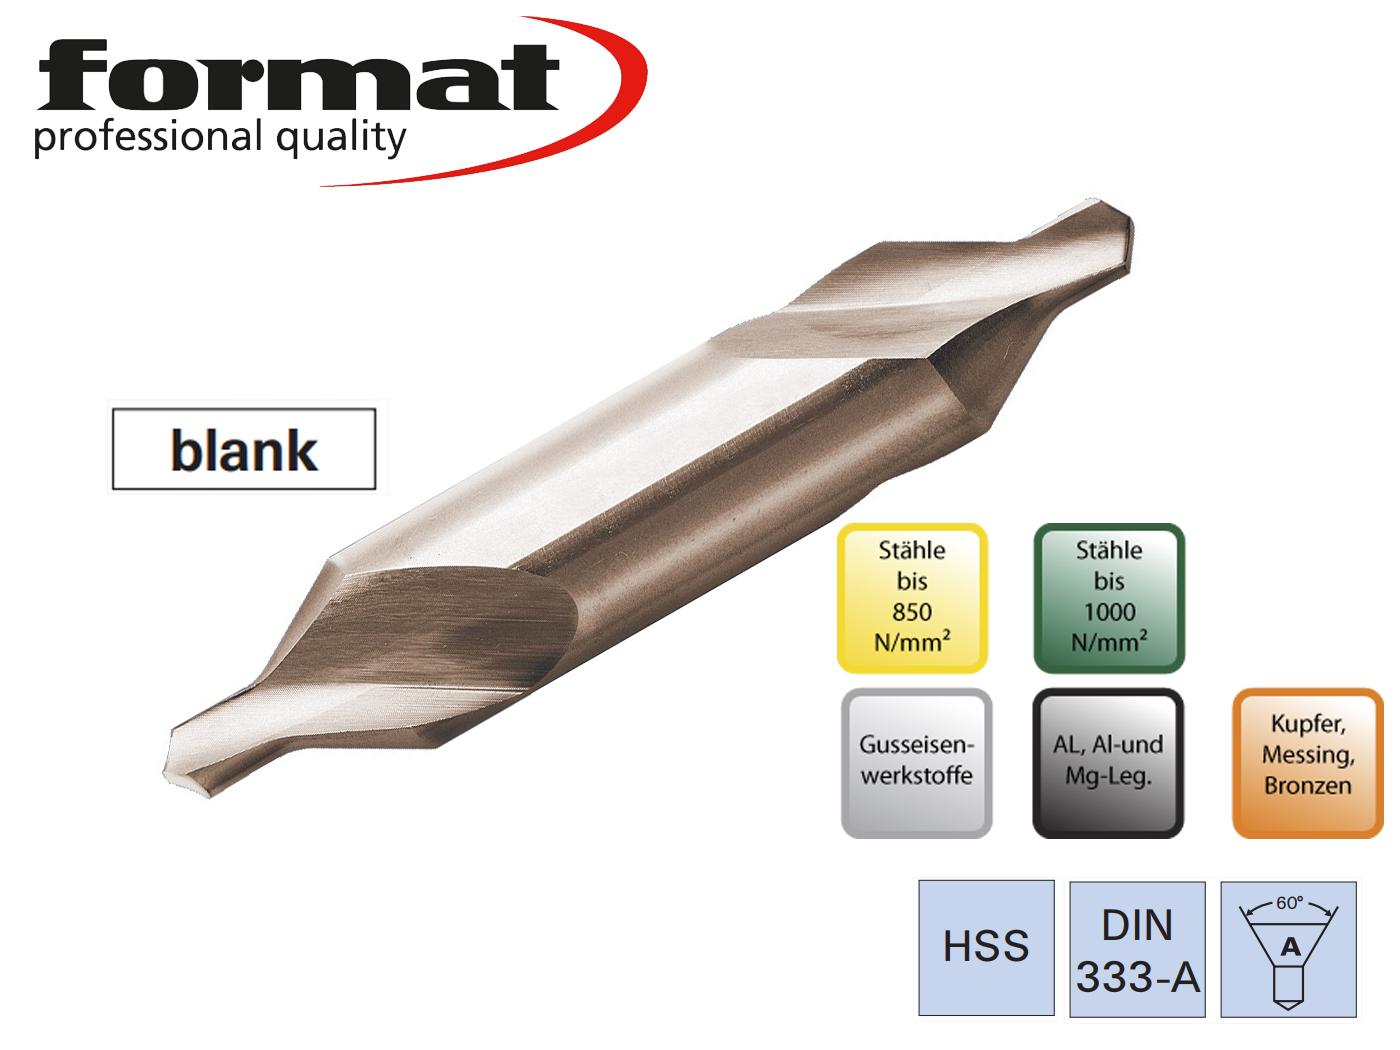 Centreerboren DIN 333 A HSS FORMAT   DKMTools - DKM Tools